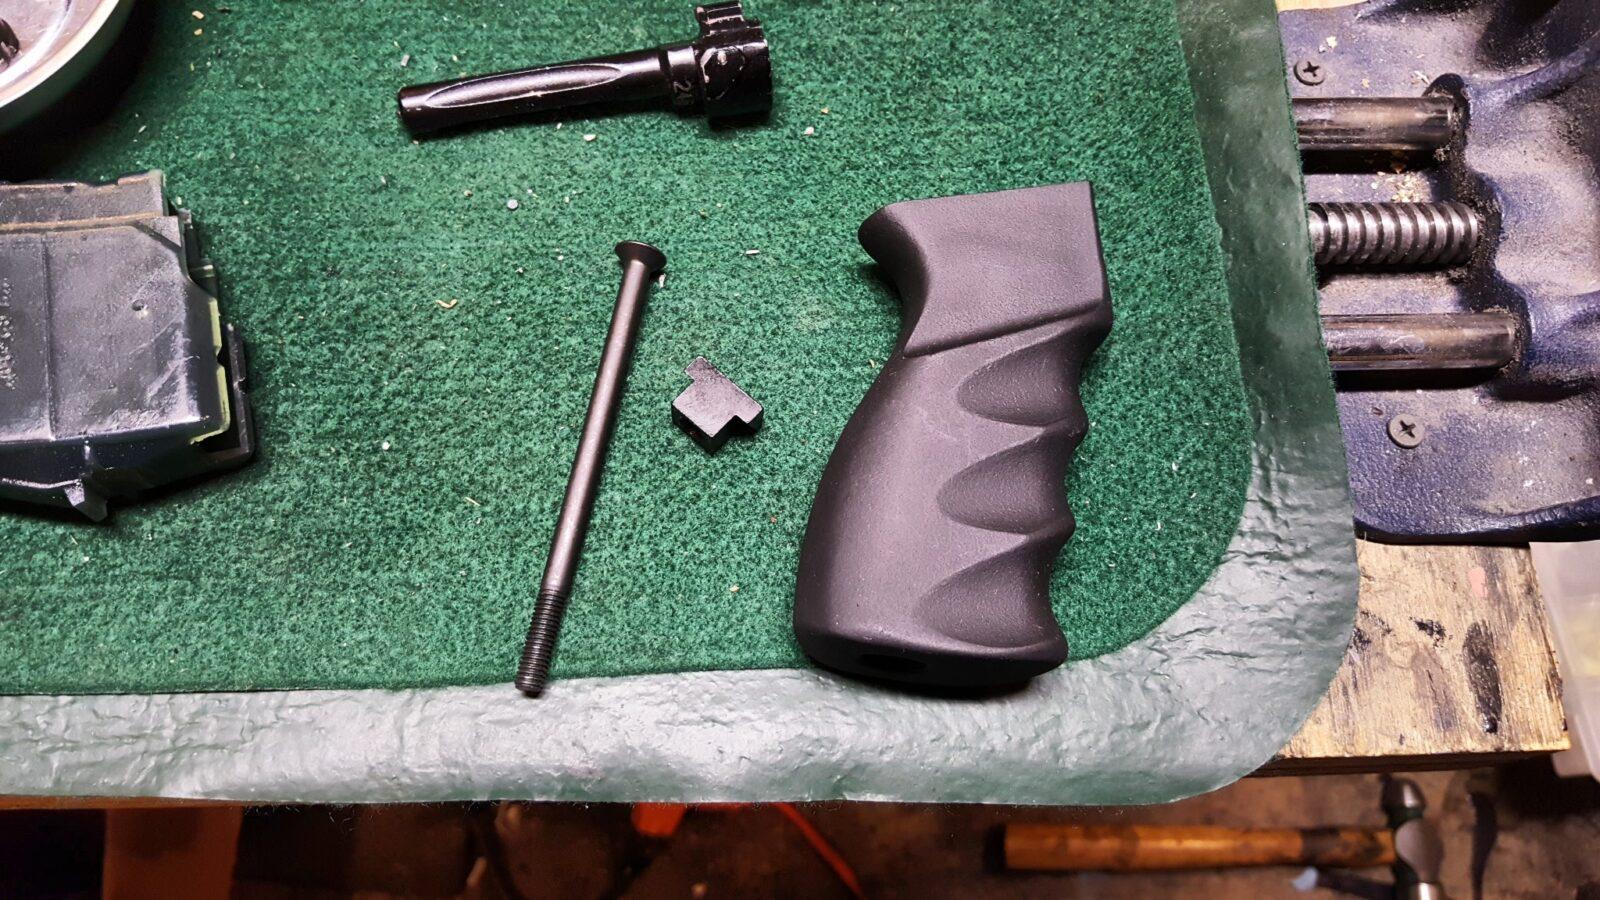 Assembling A Beryl-ish AK From A WBP Kit – Part 8